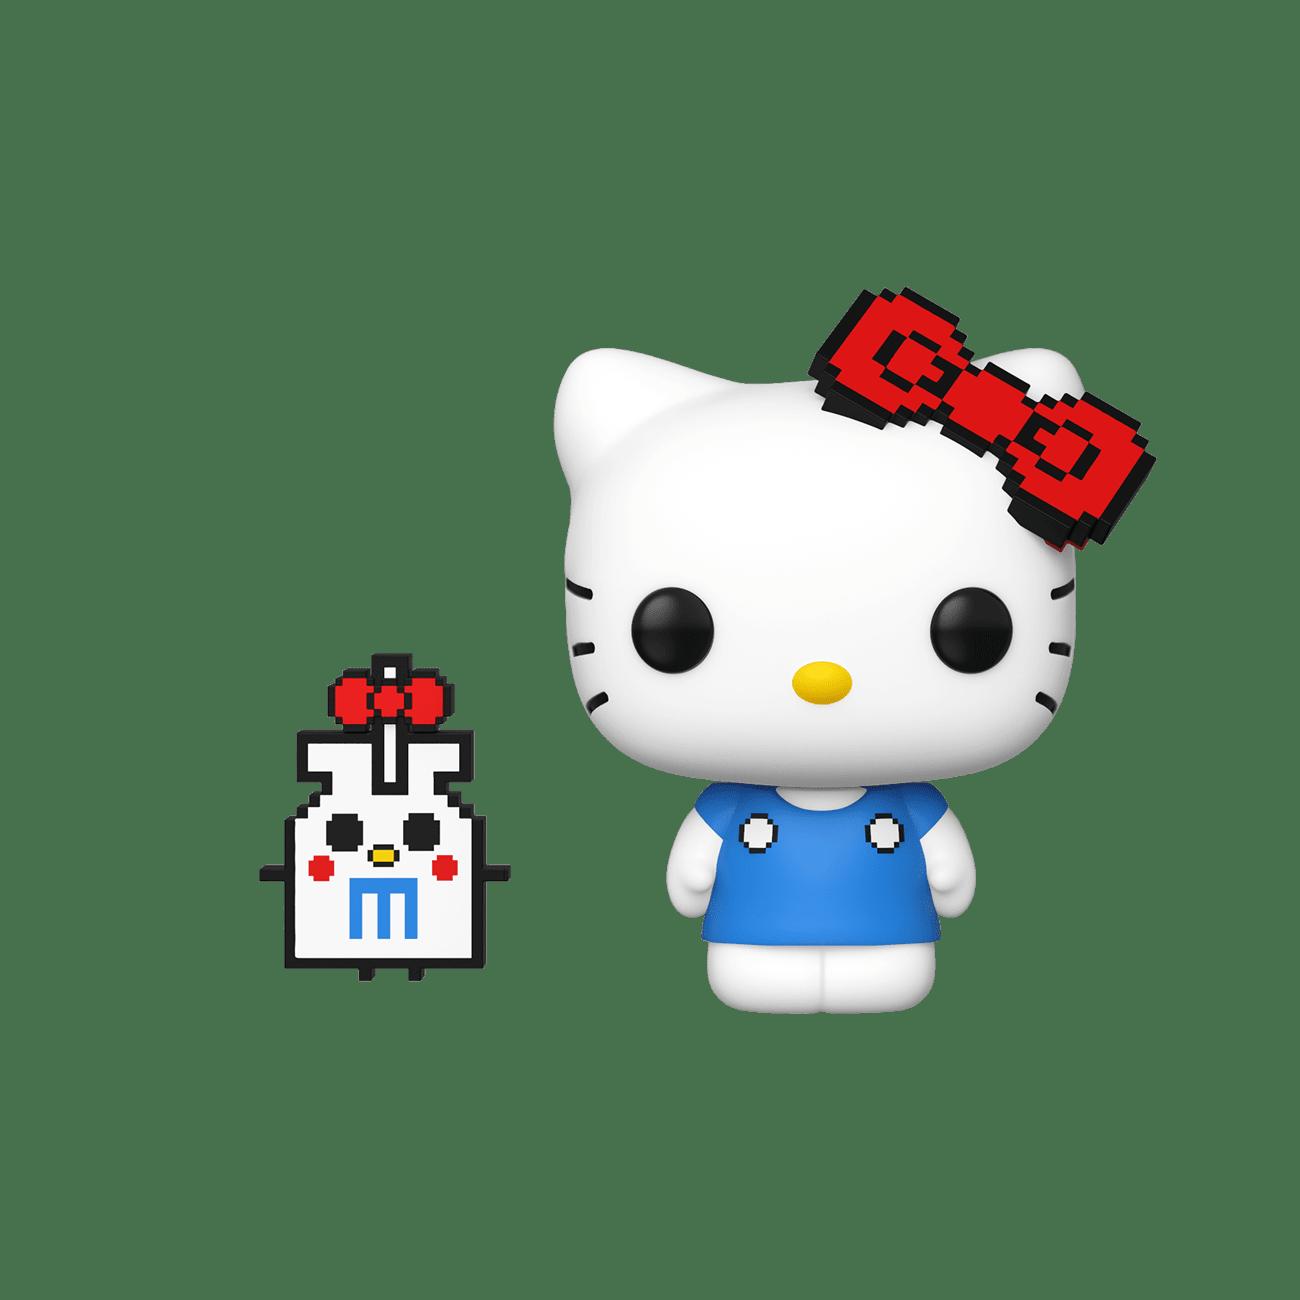 Funko Hello Kitty Anniversary Pop! Vinyl Figure and Buddy (2nd Batch)